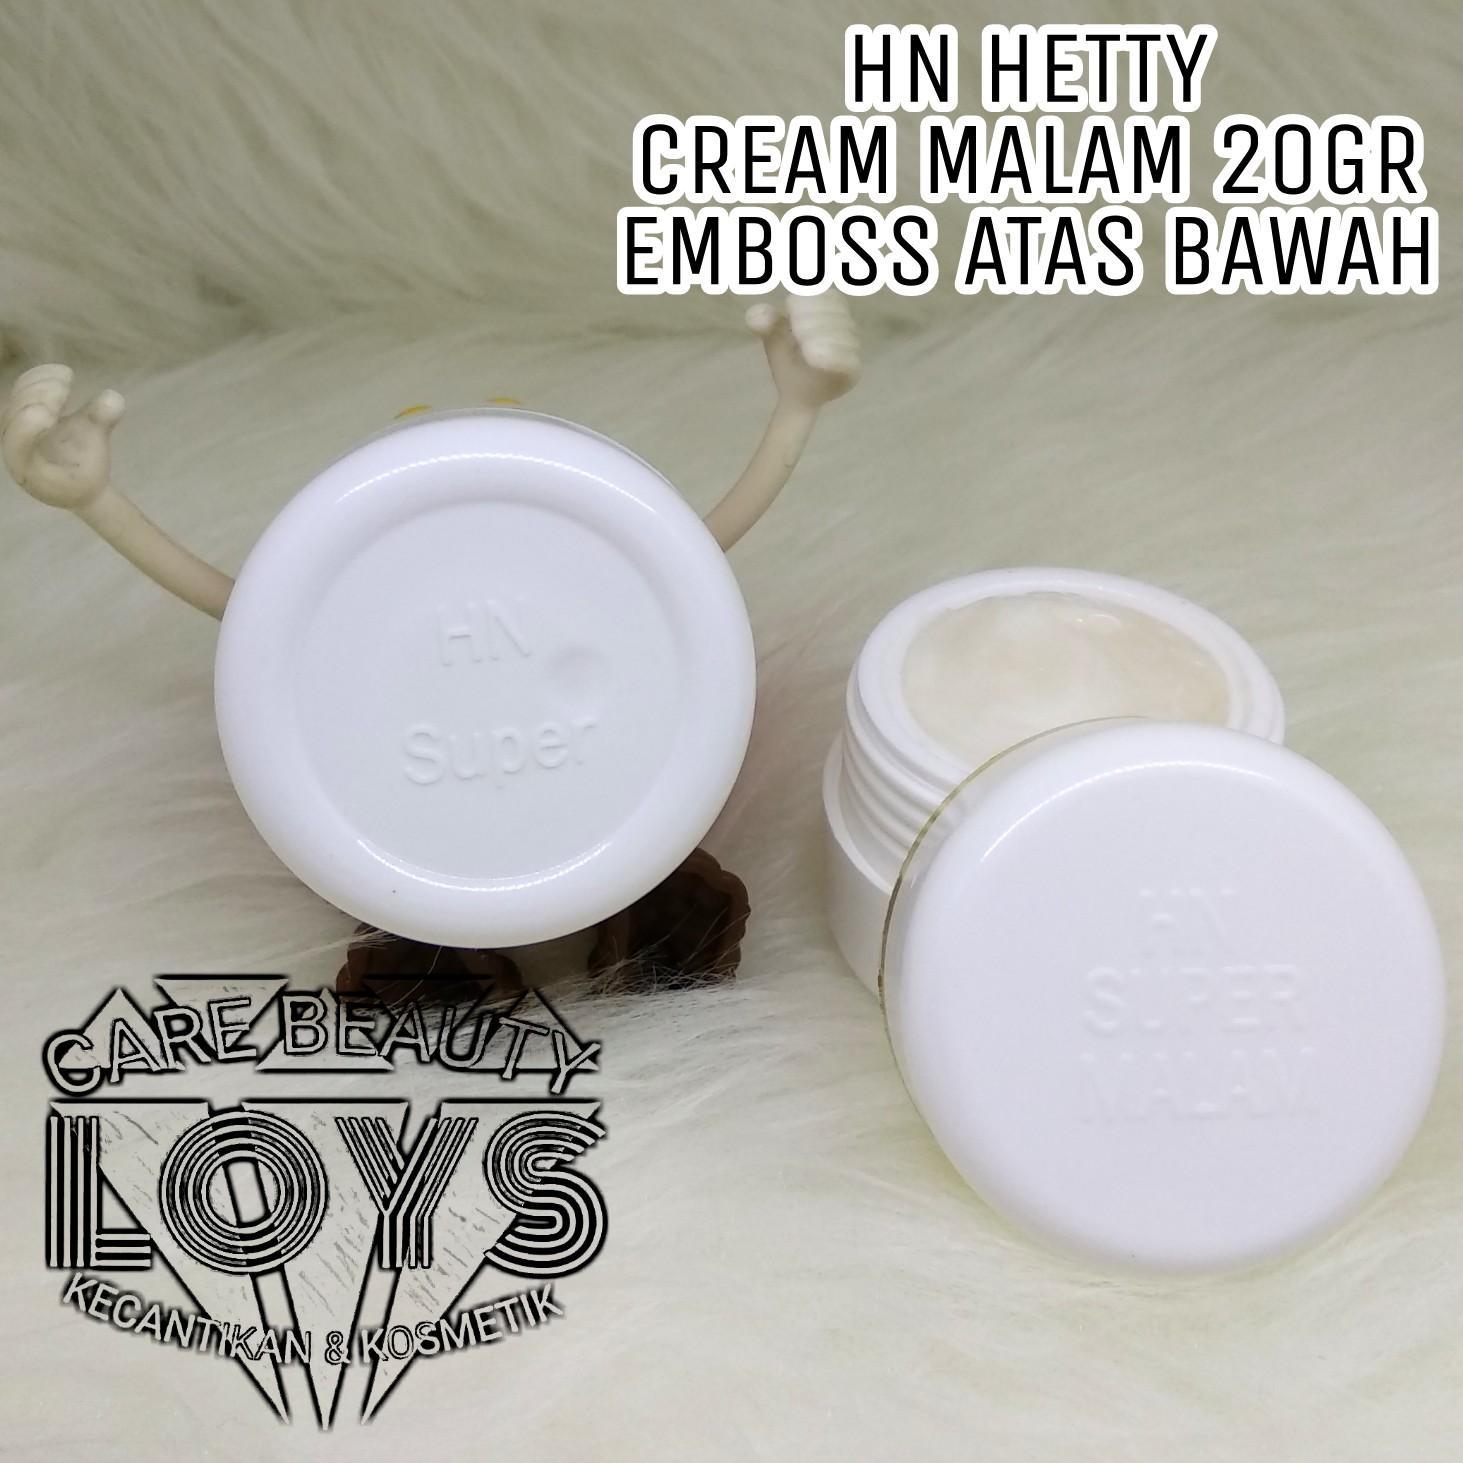 Buy Sell Cheapest Avri Cream Hn Best Quality Product Deals Sabun Kecil 60ml Hetty Nugrahati Original Asli Night 20gr Emboss Atas Bawah Malam